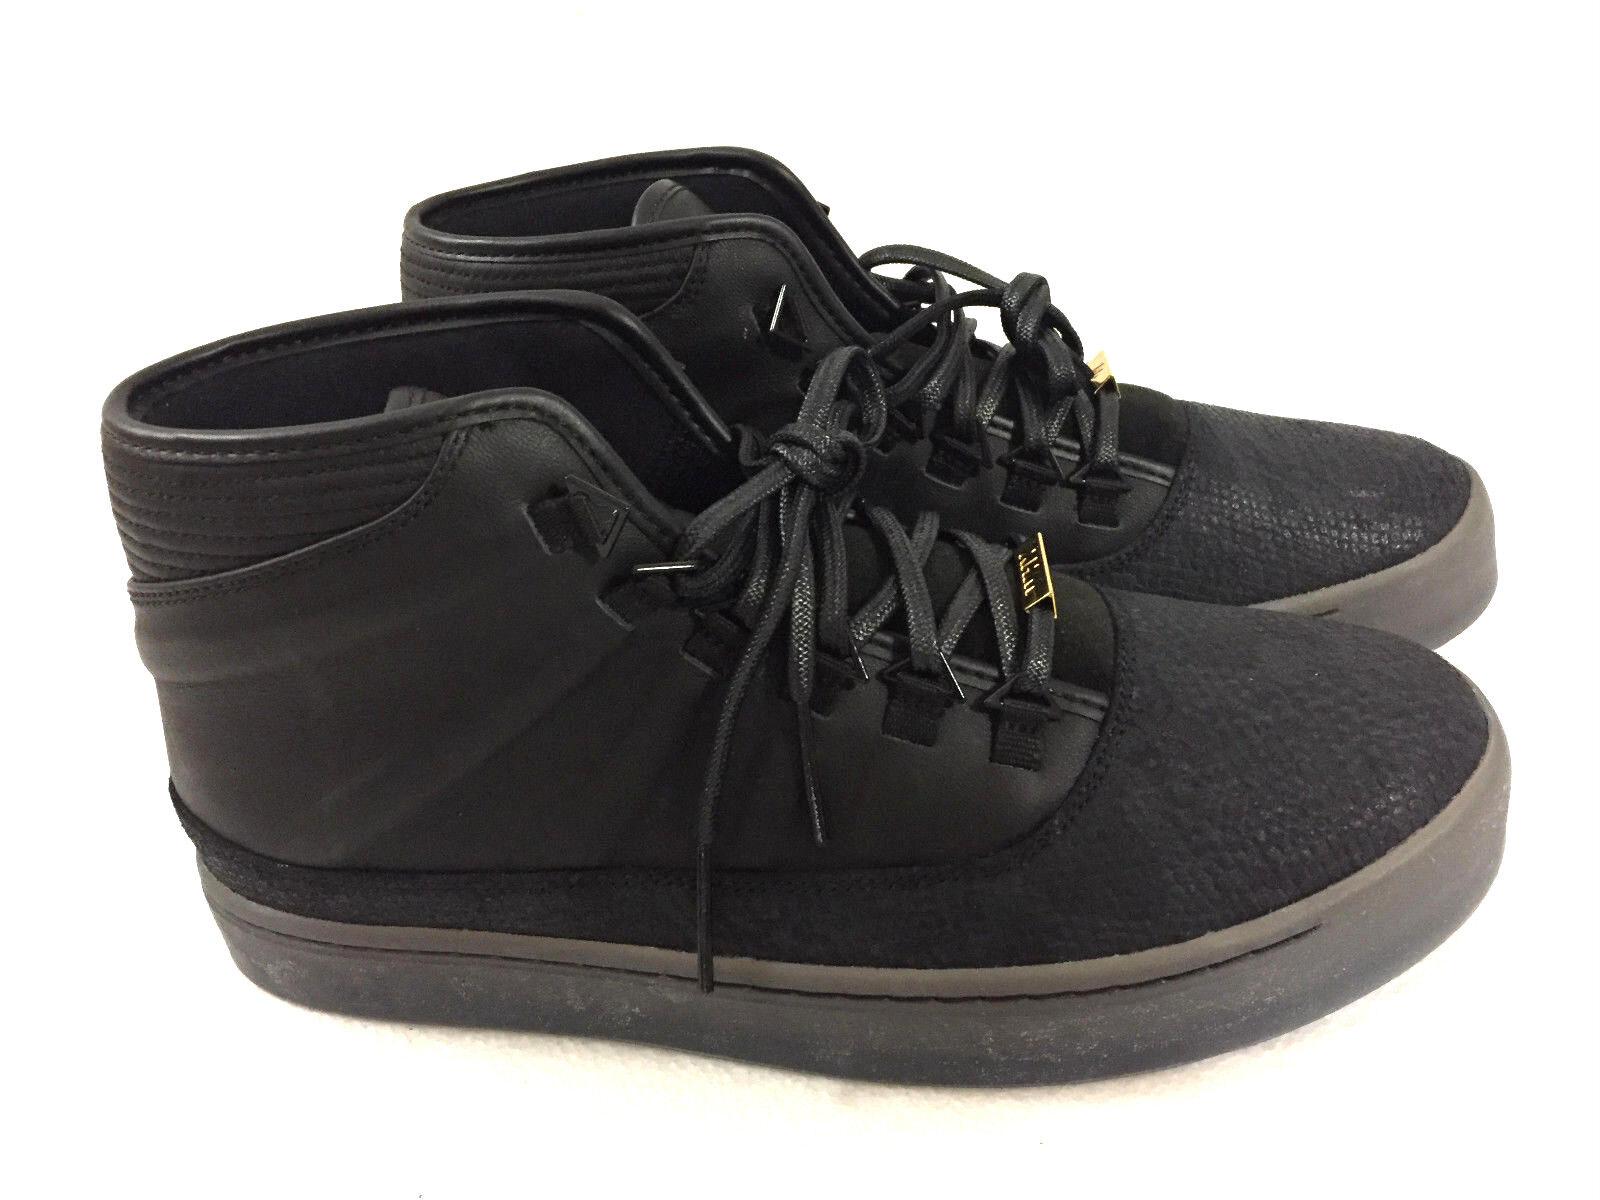 Gli uomini sono nike air jordan 768934 010 nero scarpe taglia westbrook